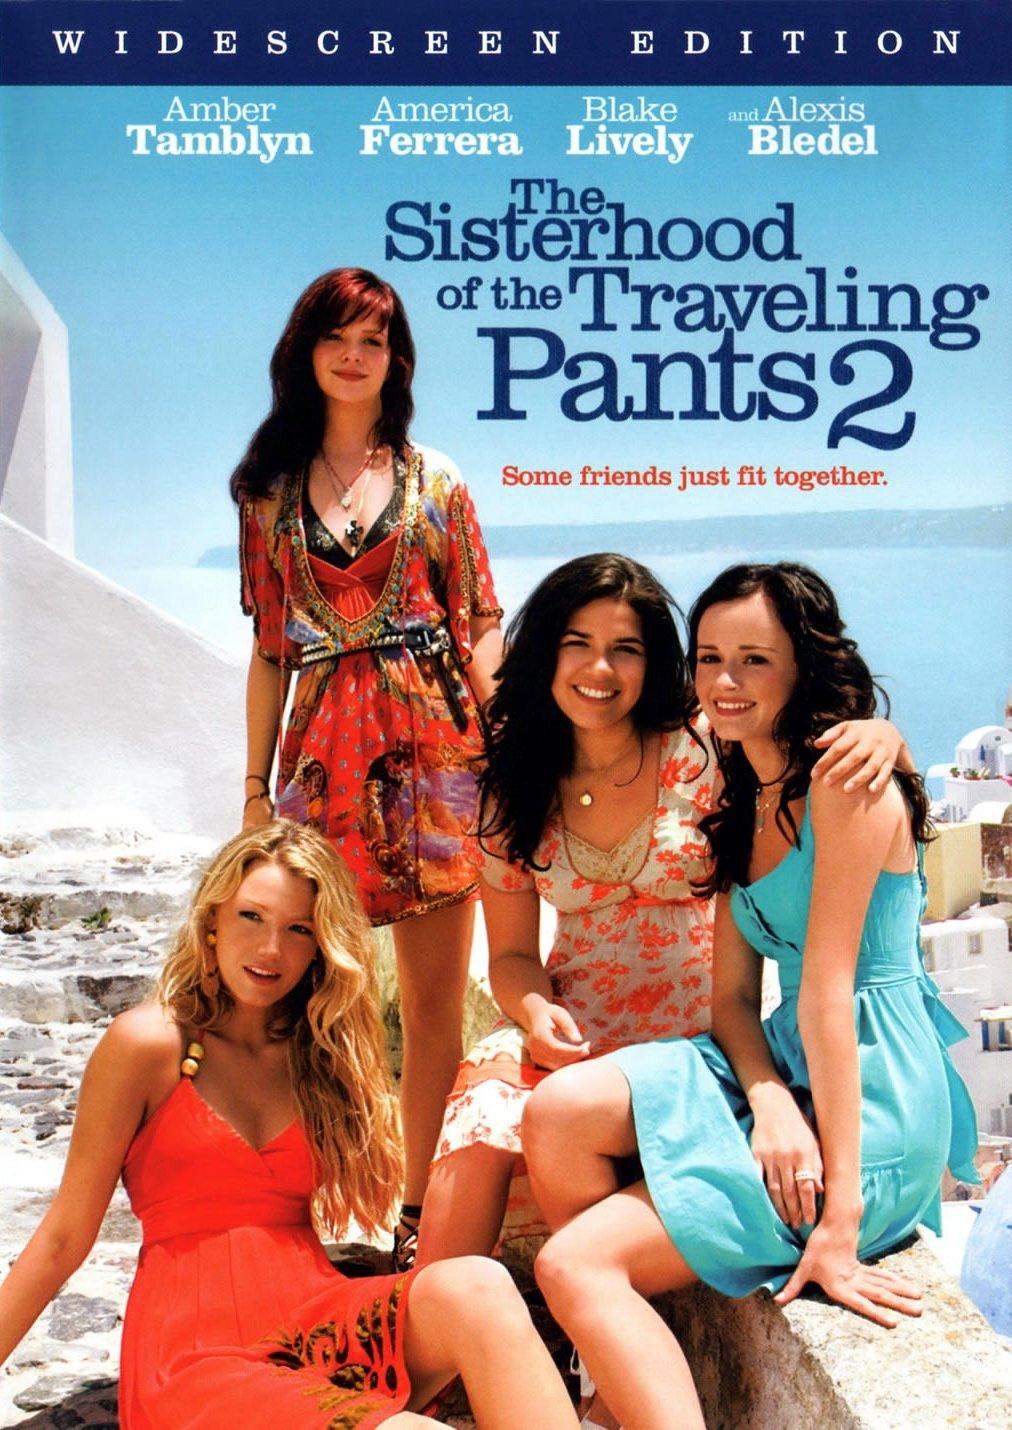 The sisterhood of the traveling pants 2 full movie